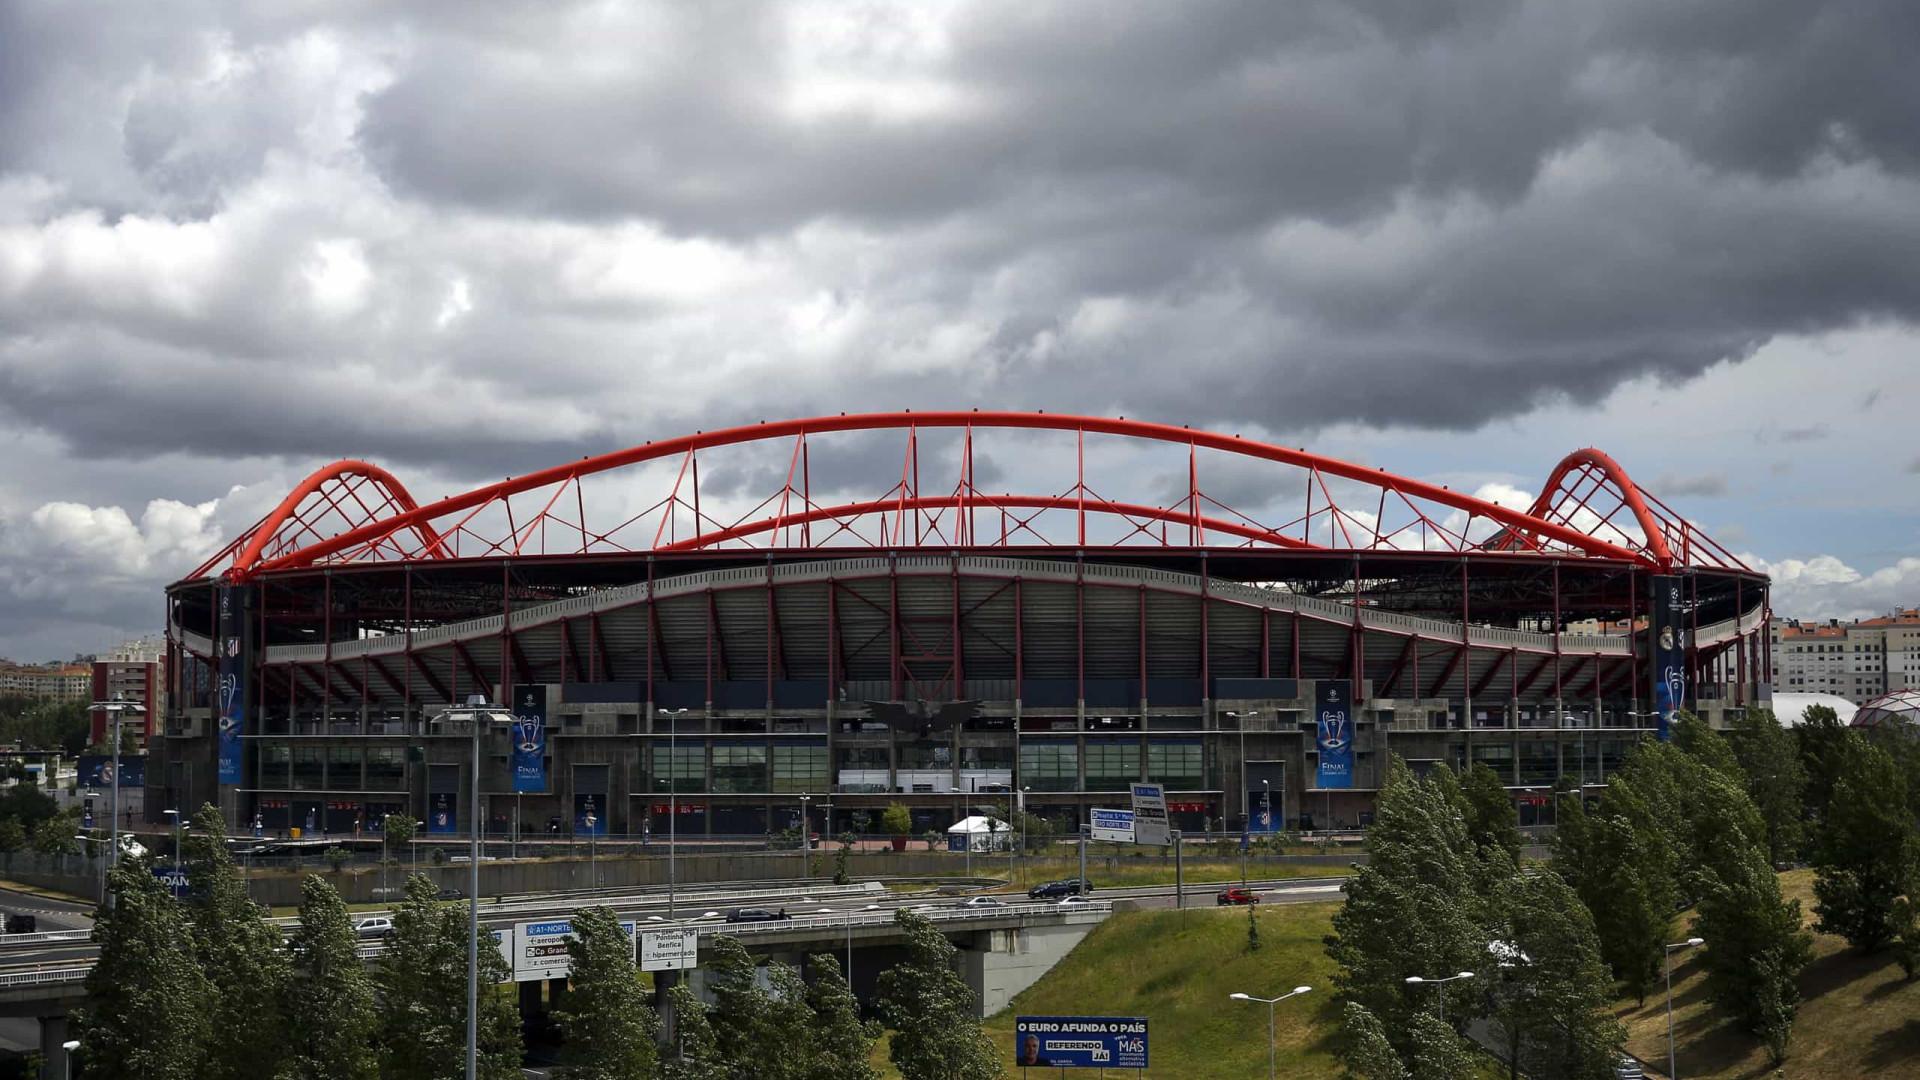 Adiado julgamento de adepto italiano morto junto ao Estádio da Luz